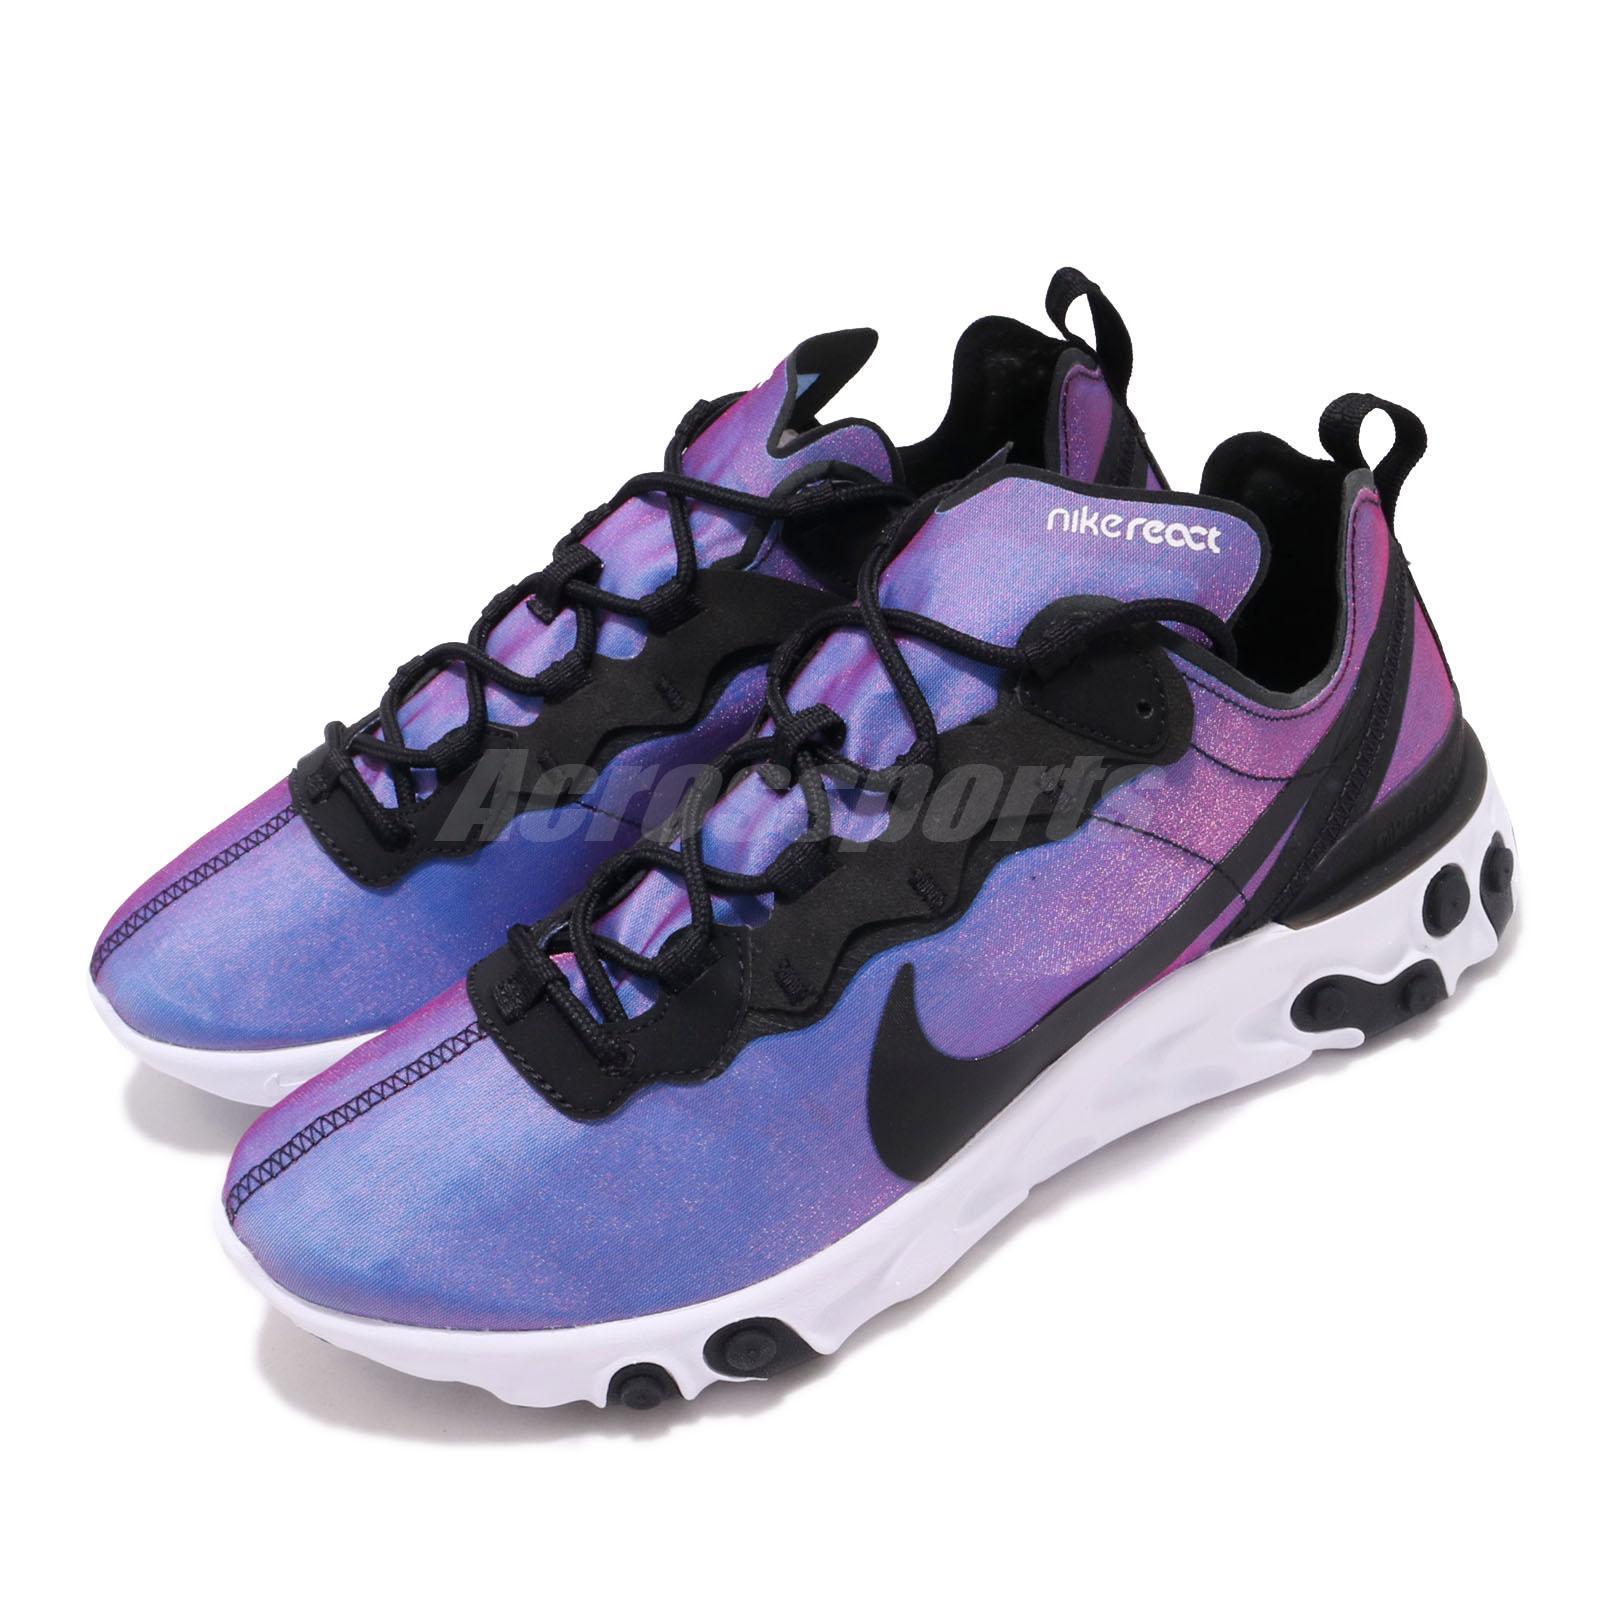 Nike React Element 55 PRM SU19 Black Laser Fuchsia Men Running Shoes BQ9241-002